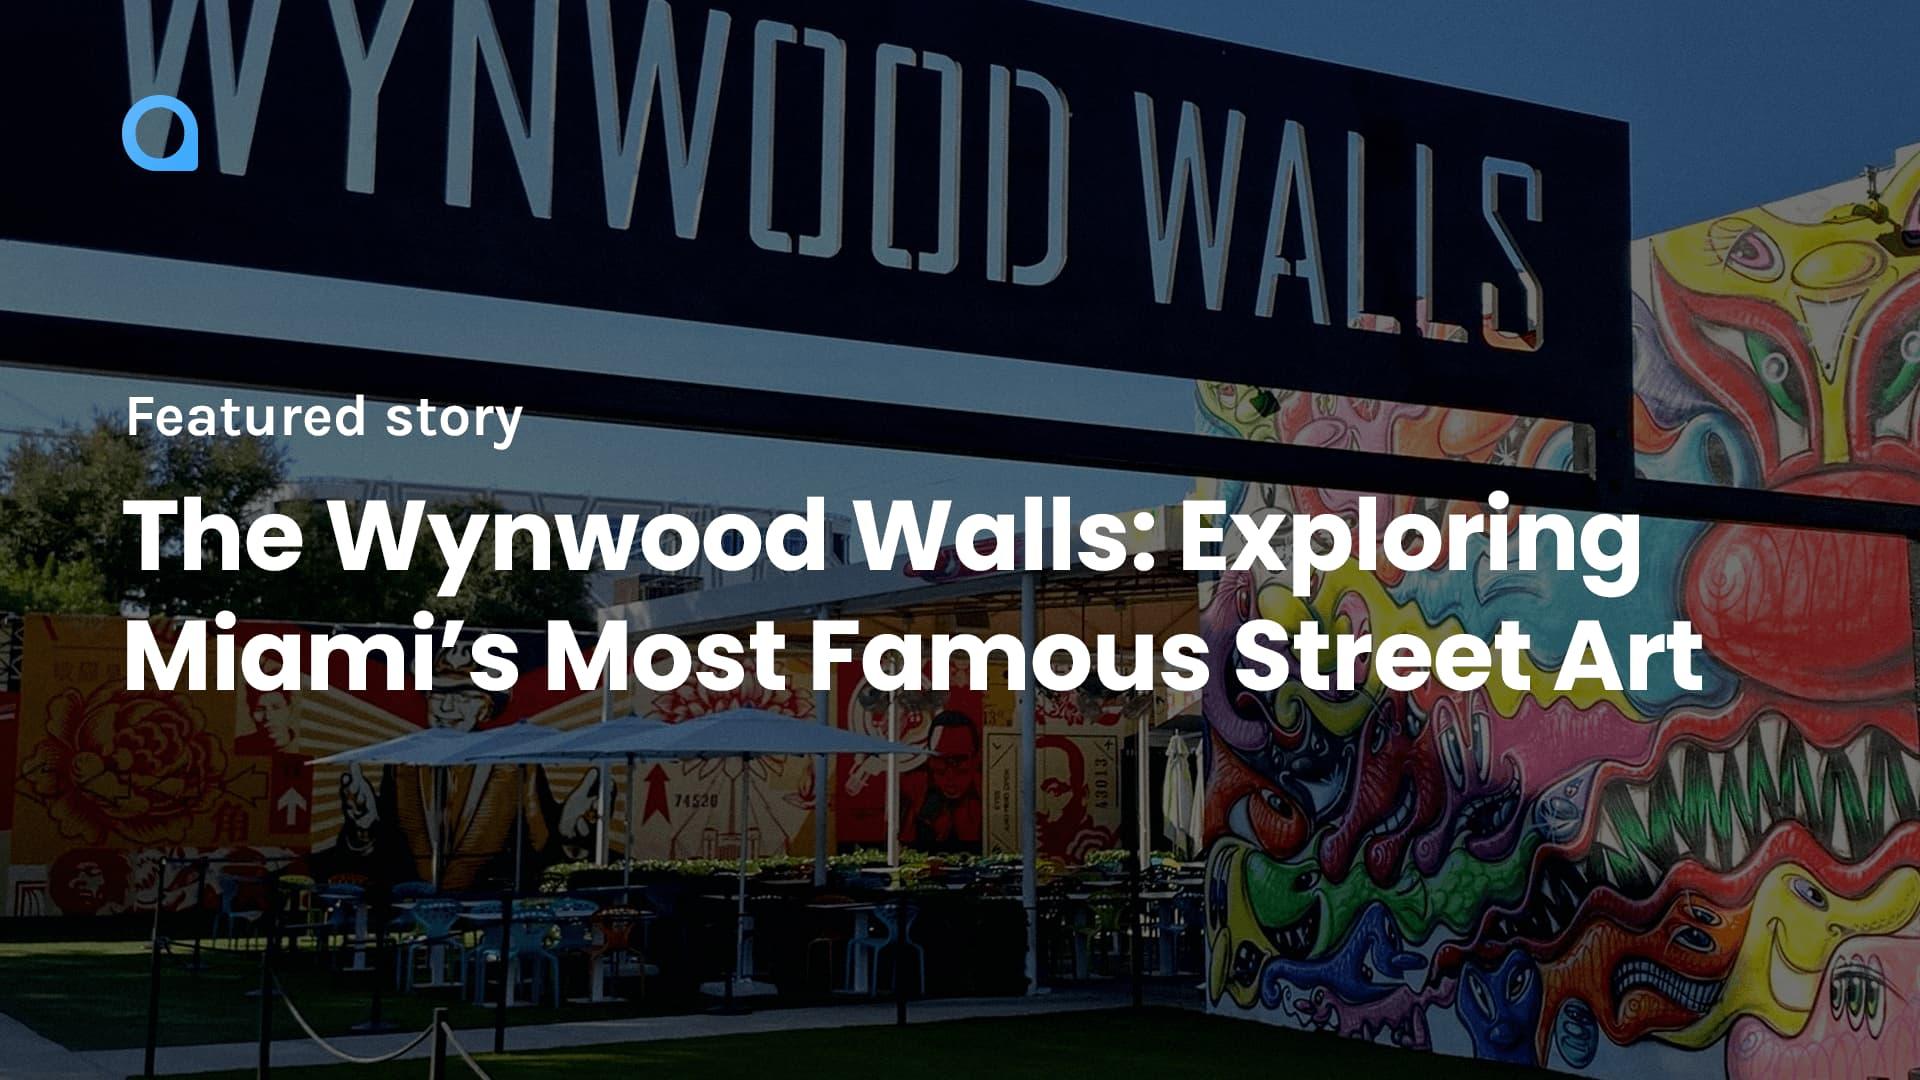 The Wynwood Walls: Exploring Miami's Most Famous Street Art